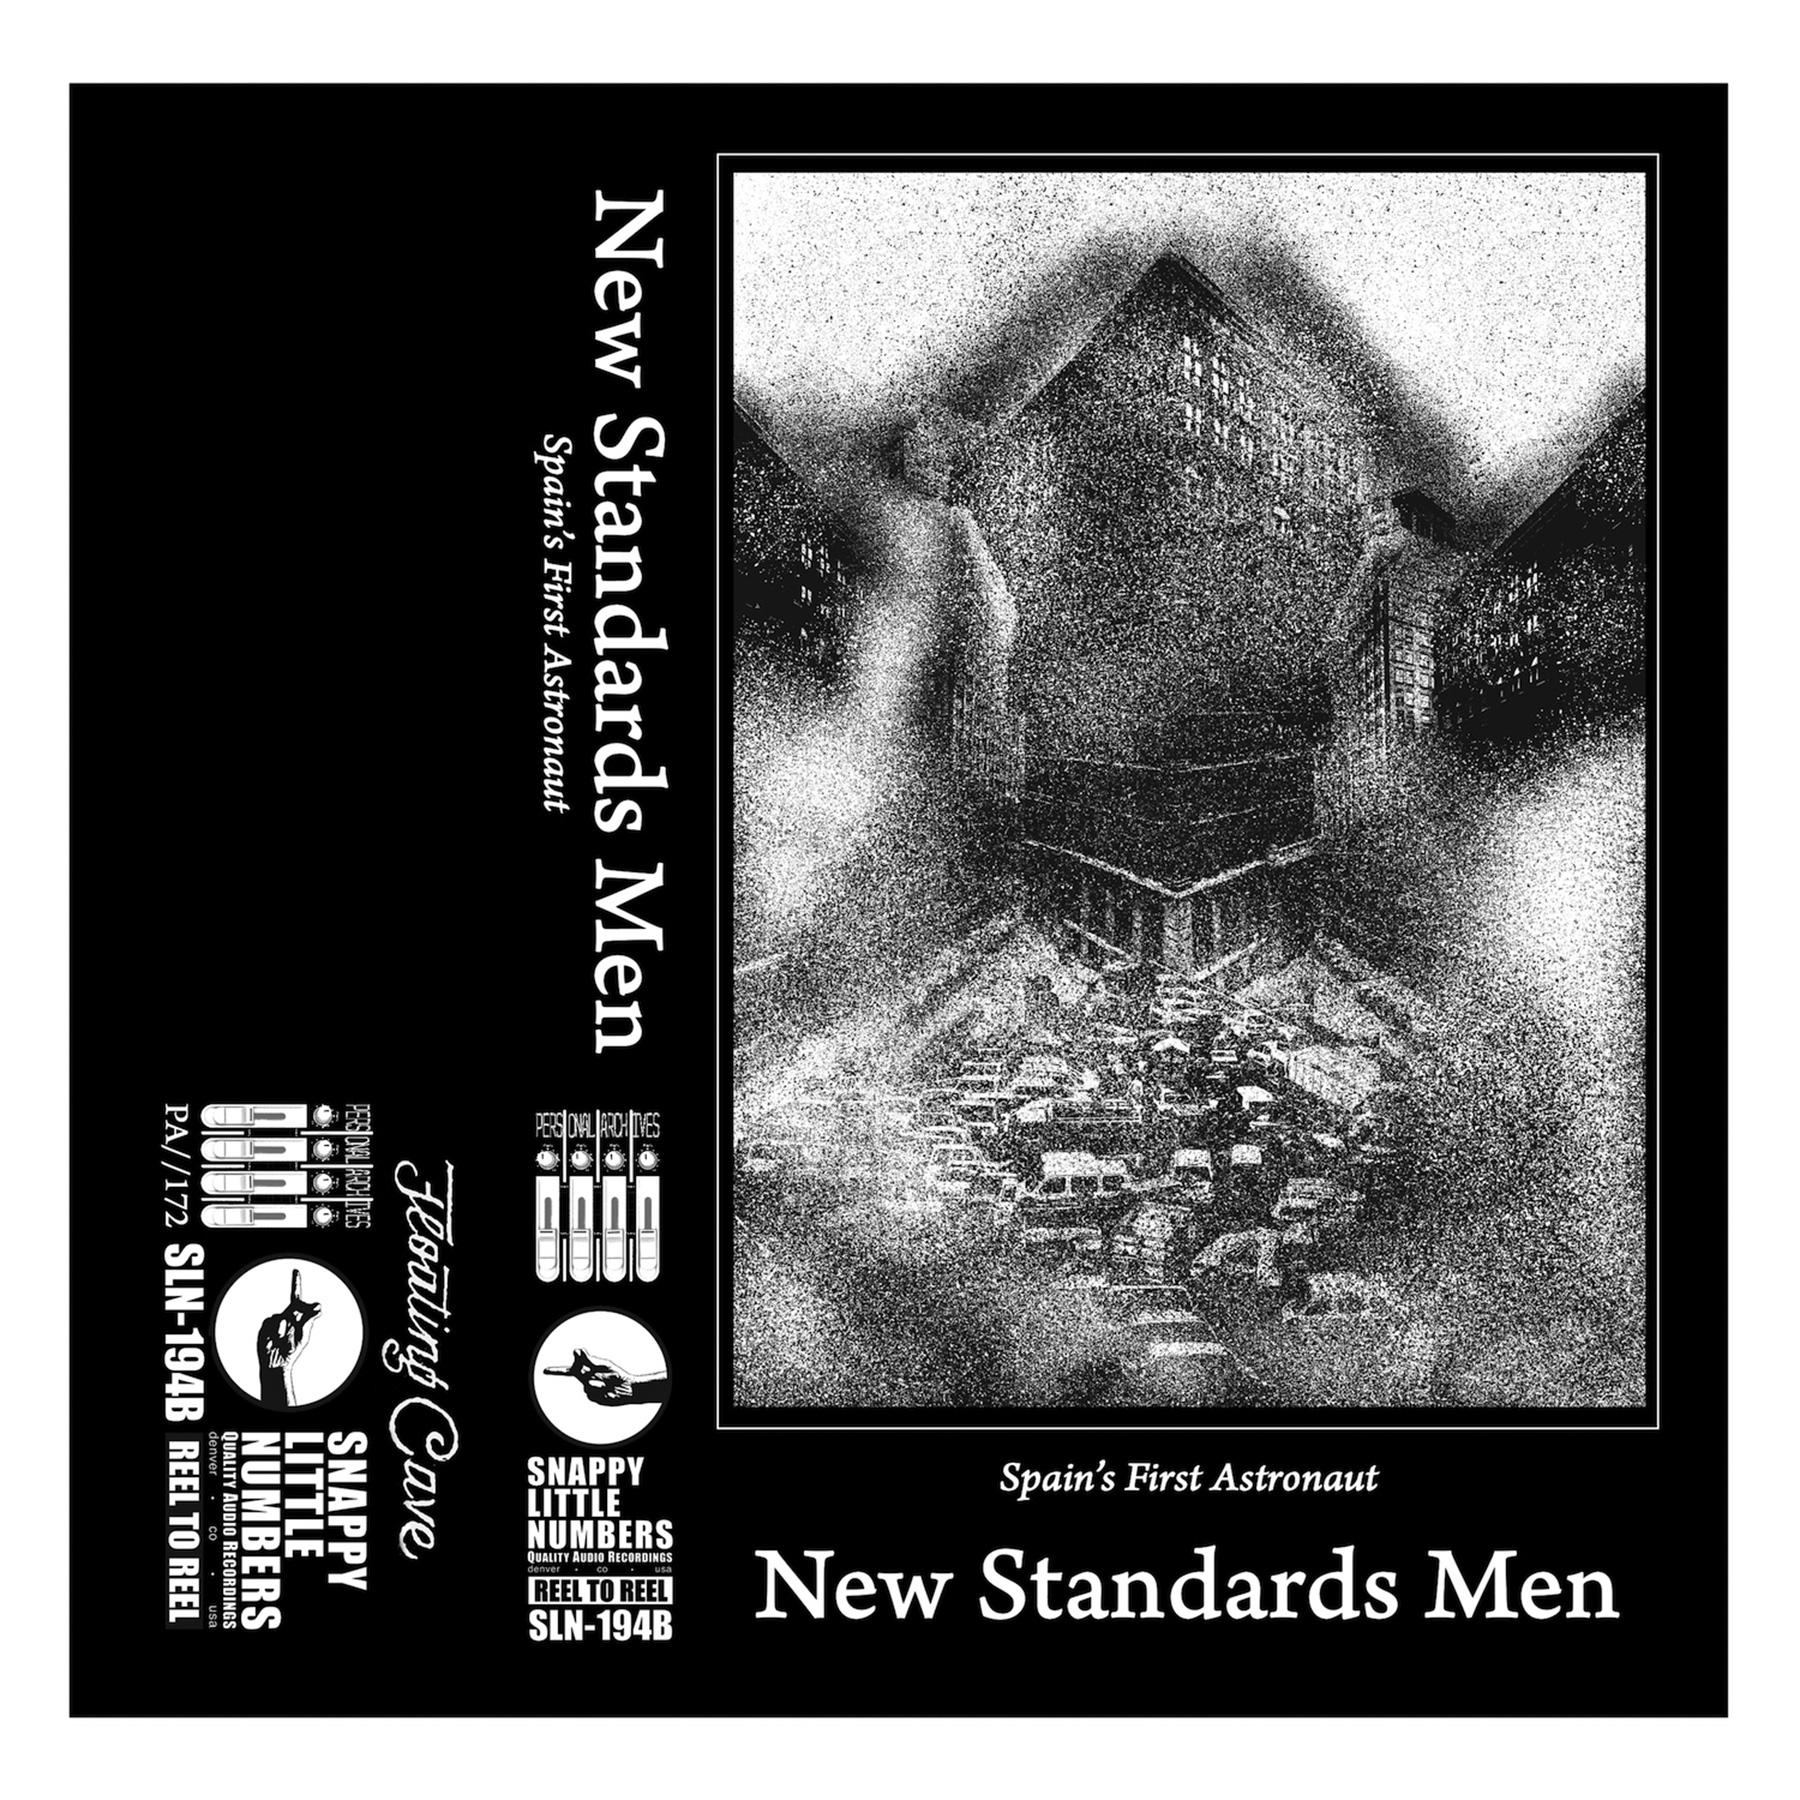 NewStandardsMen_SpainsFirstAstronaut_OctoberQueenCitySounds_TomMurphy